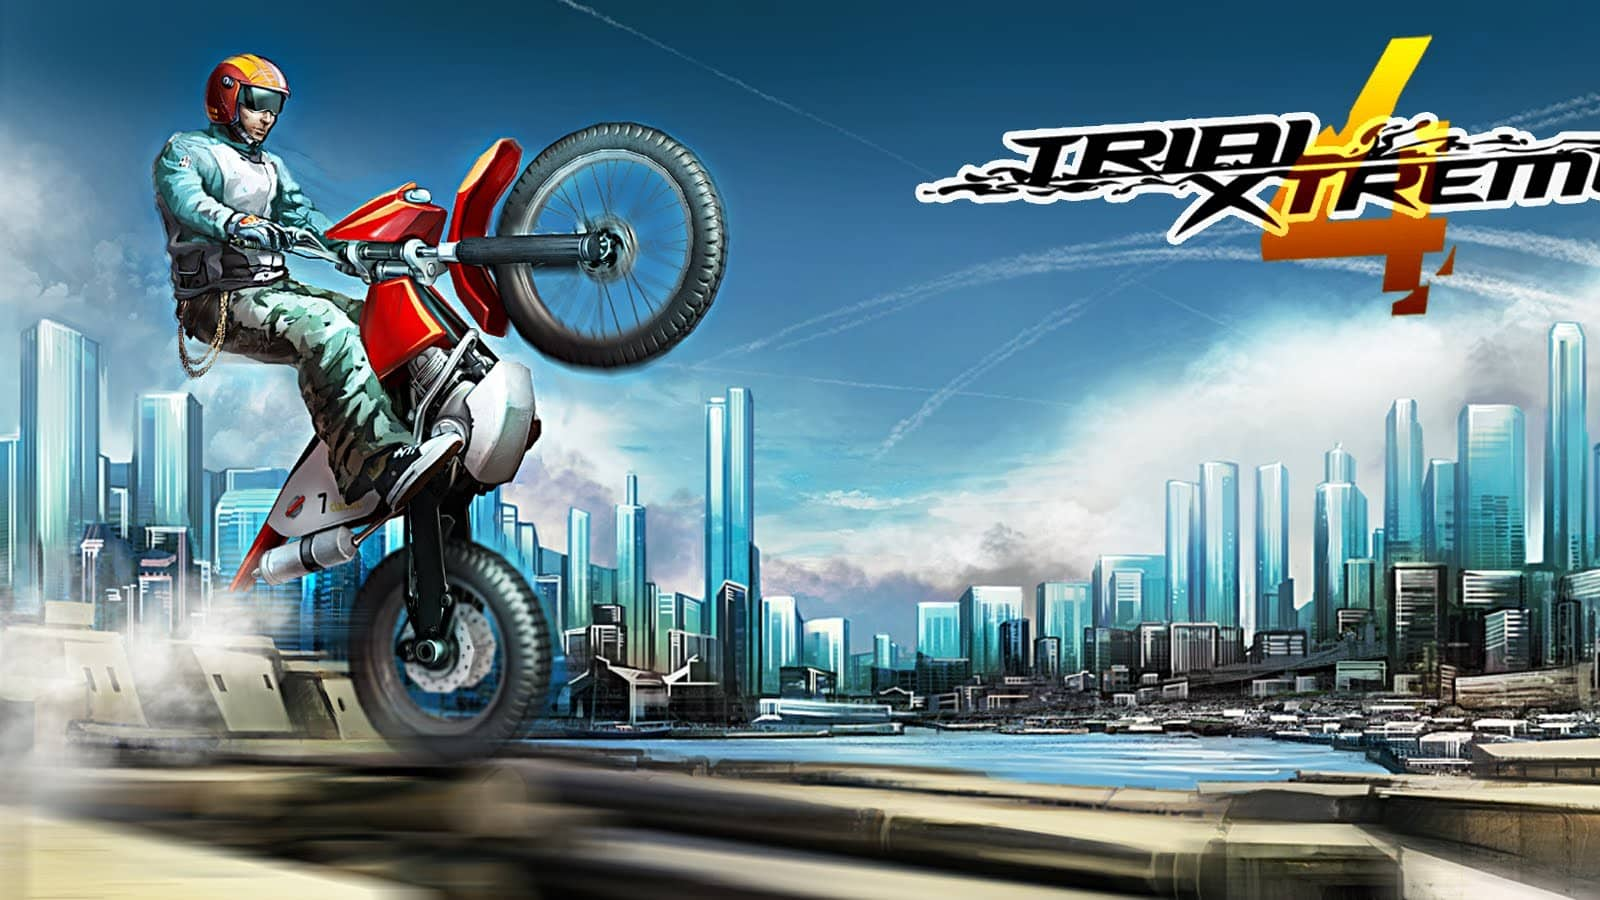 تحميل لعبة Trial Xtreme 4 للايفون